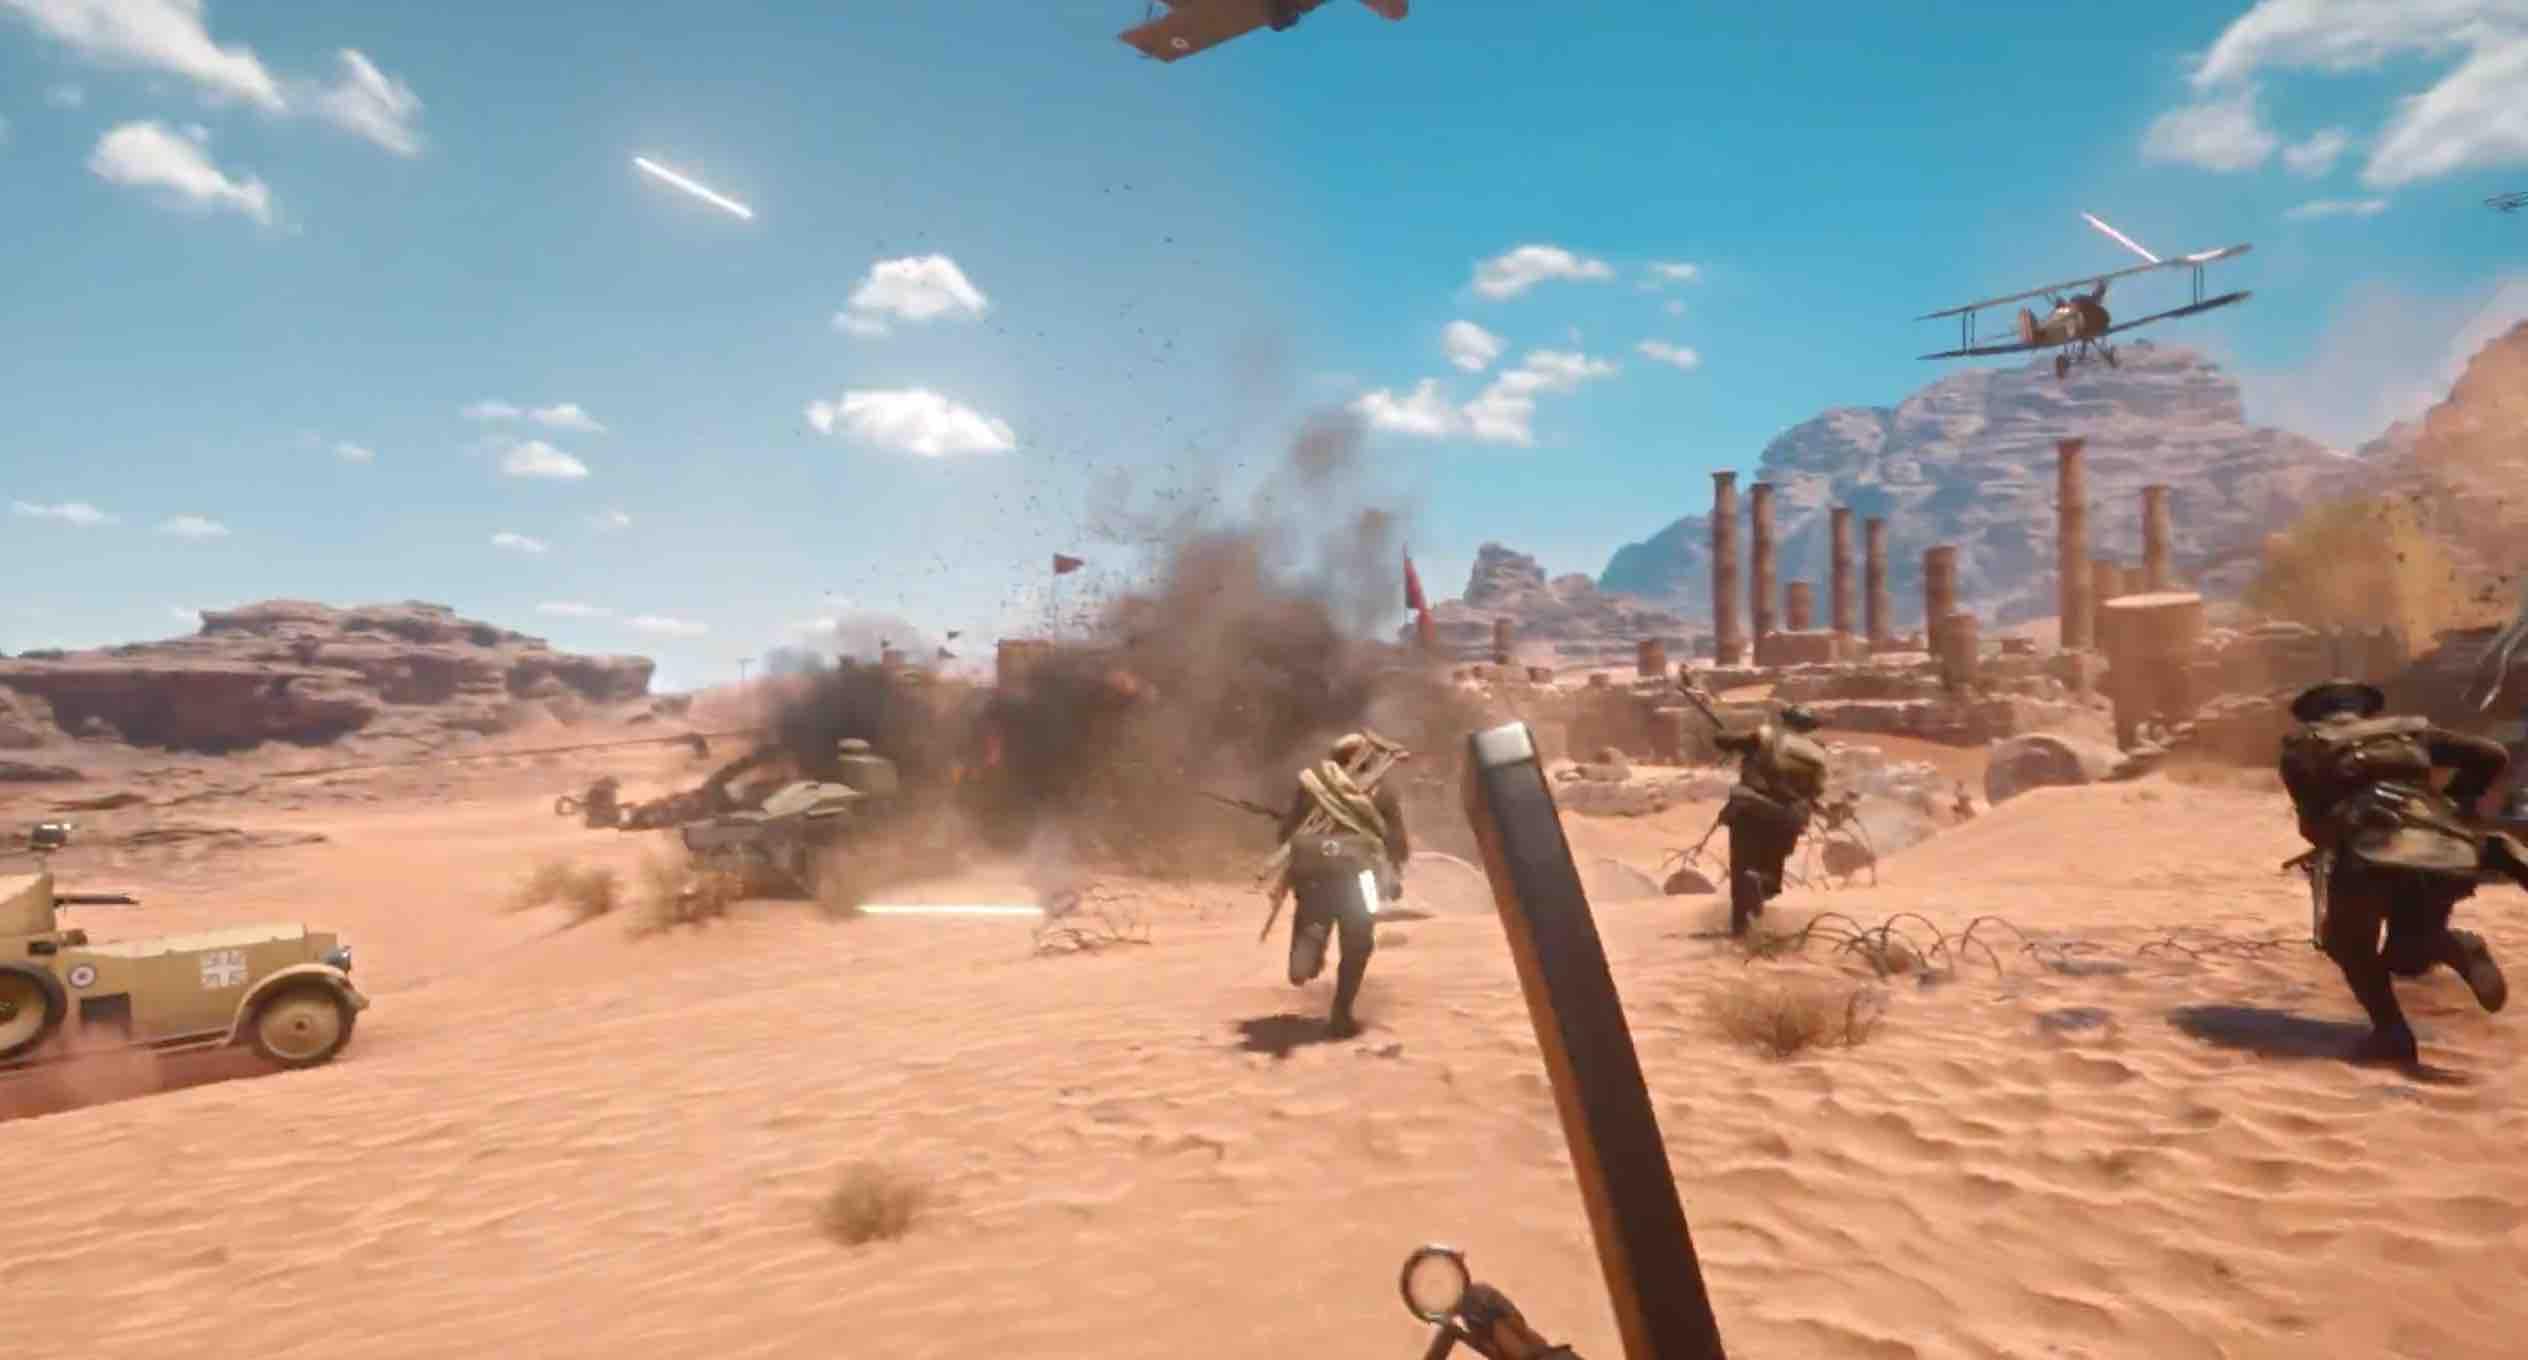 battlefield-1-gameplay-trailer-image-1-kopie